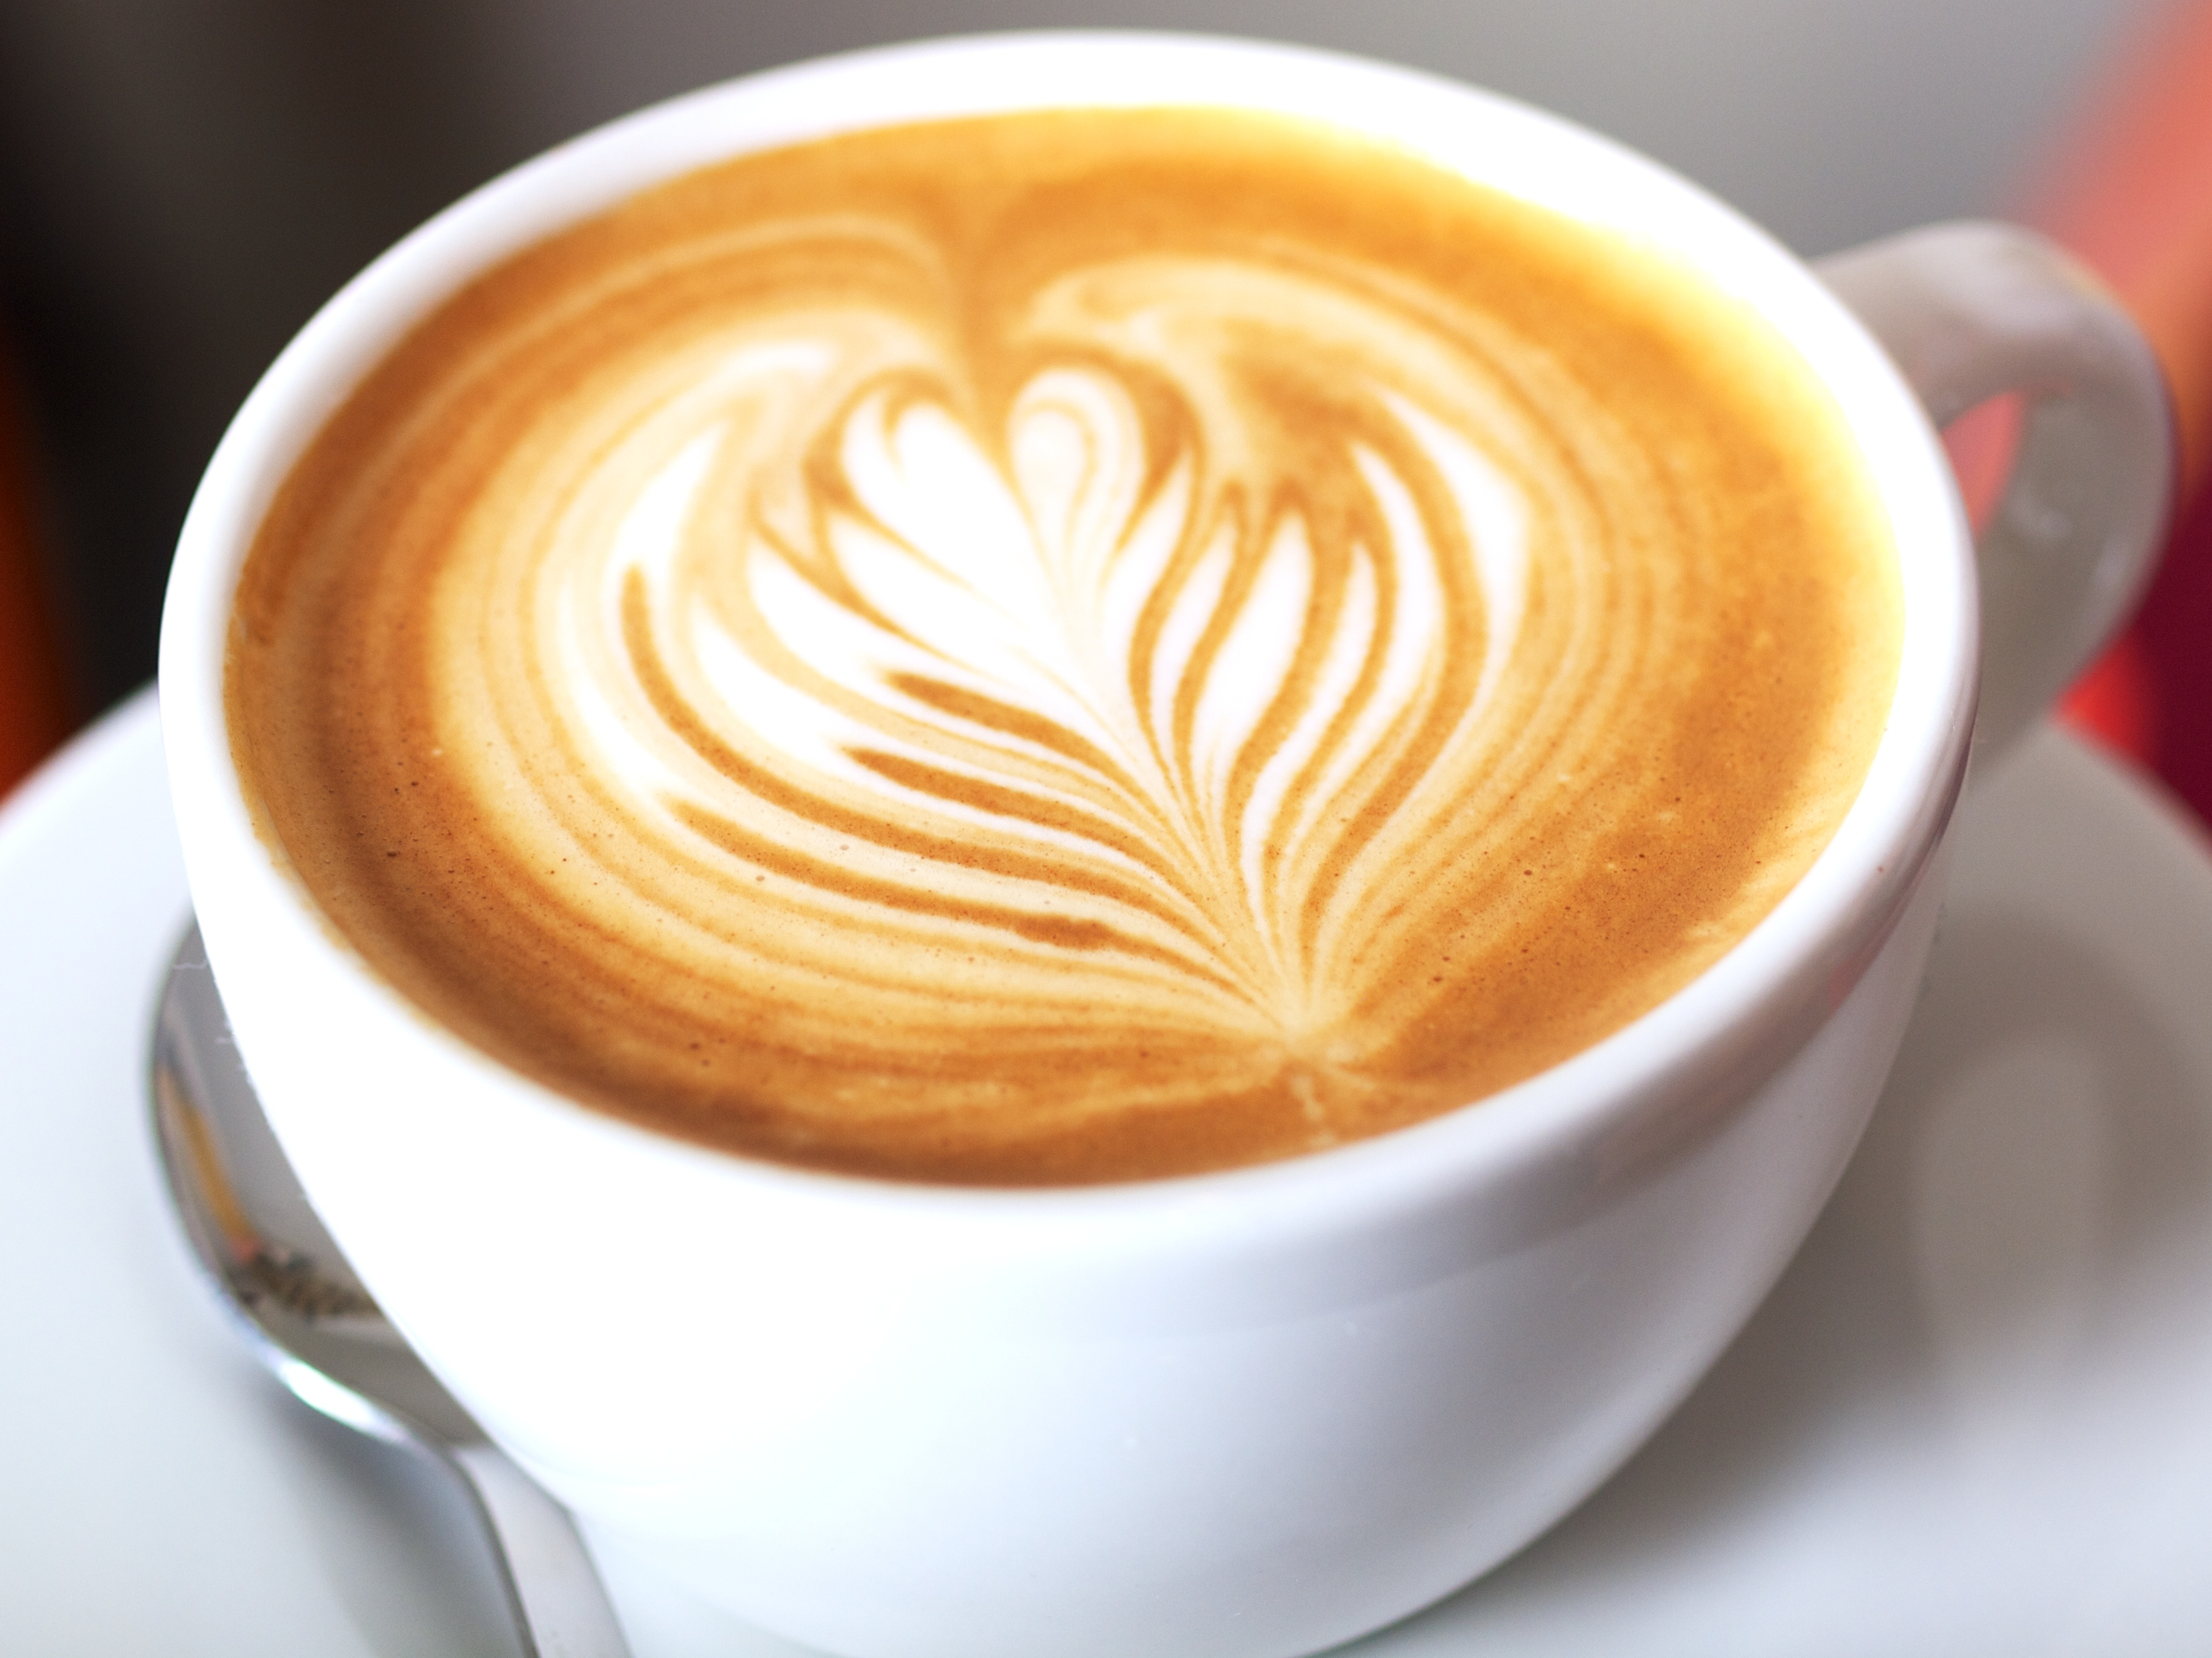 Buy cappuccino e liquid 10ml bottle vapable - Bilder cappuccino ...